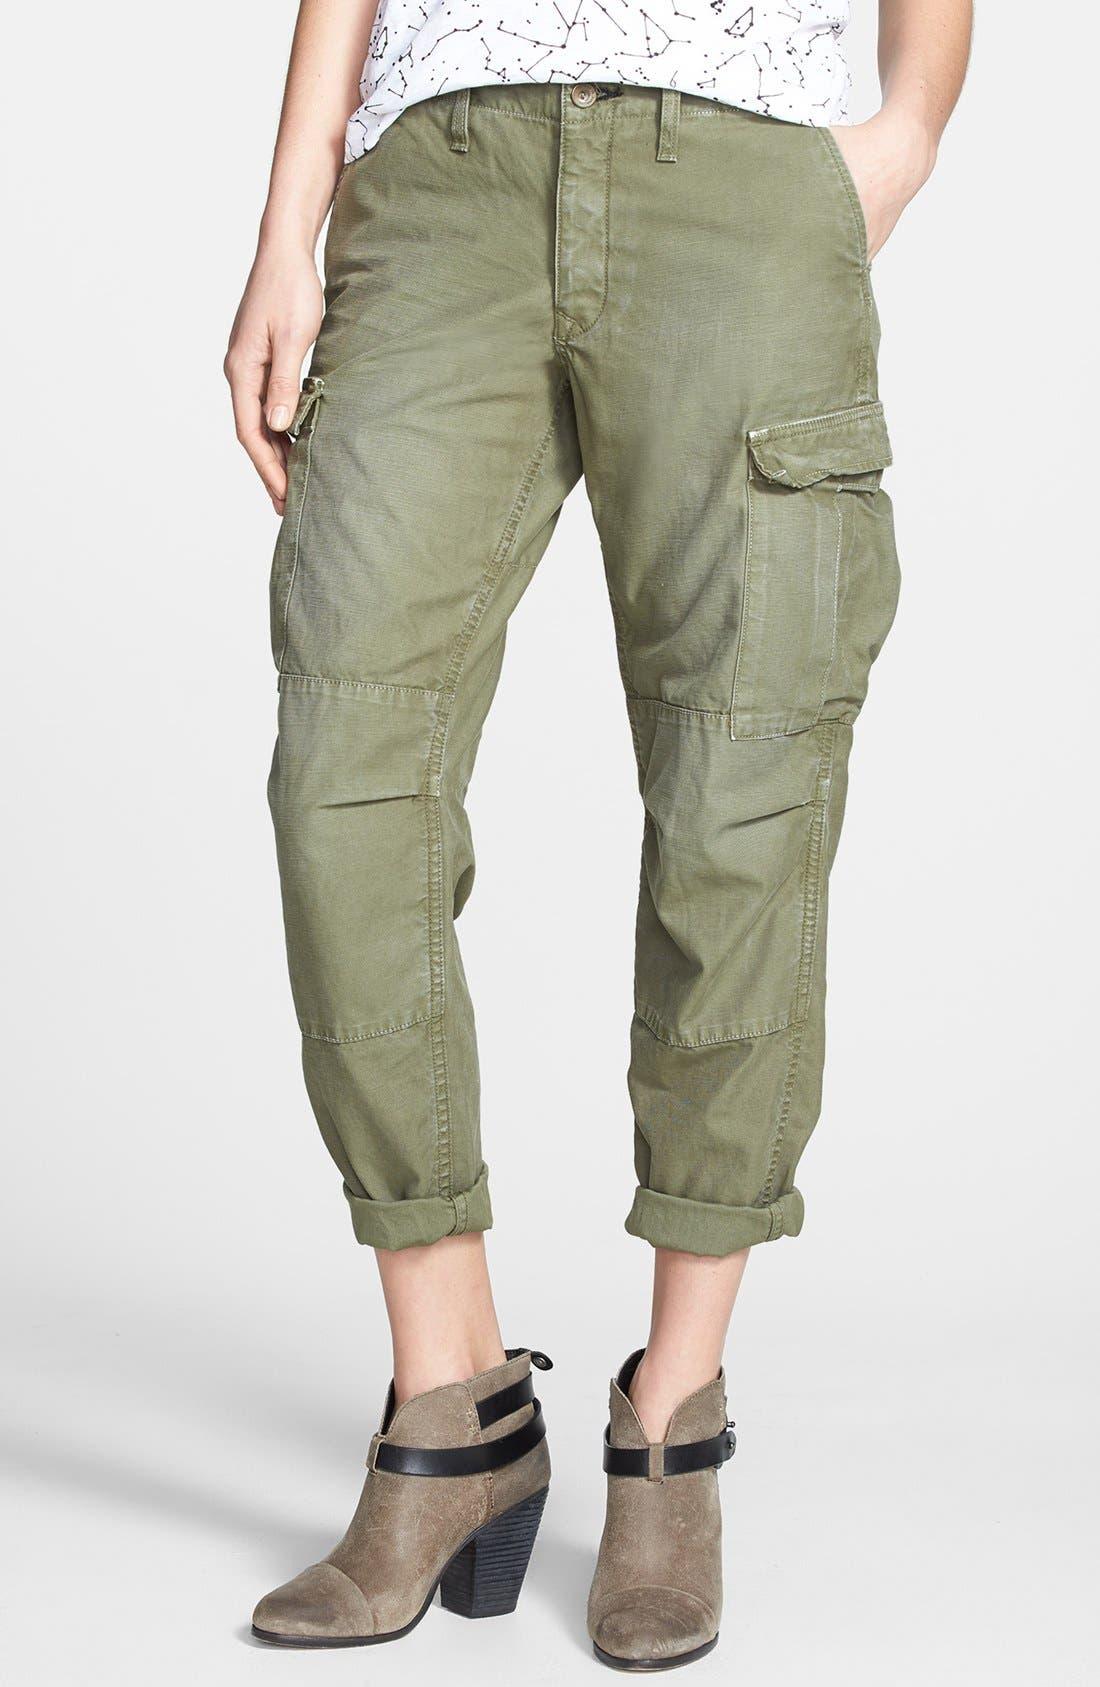 JEAN 'Combat' Cargo Pants,                             Main thumbnail 1, color,                             300